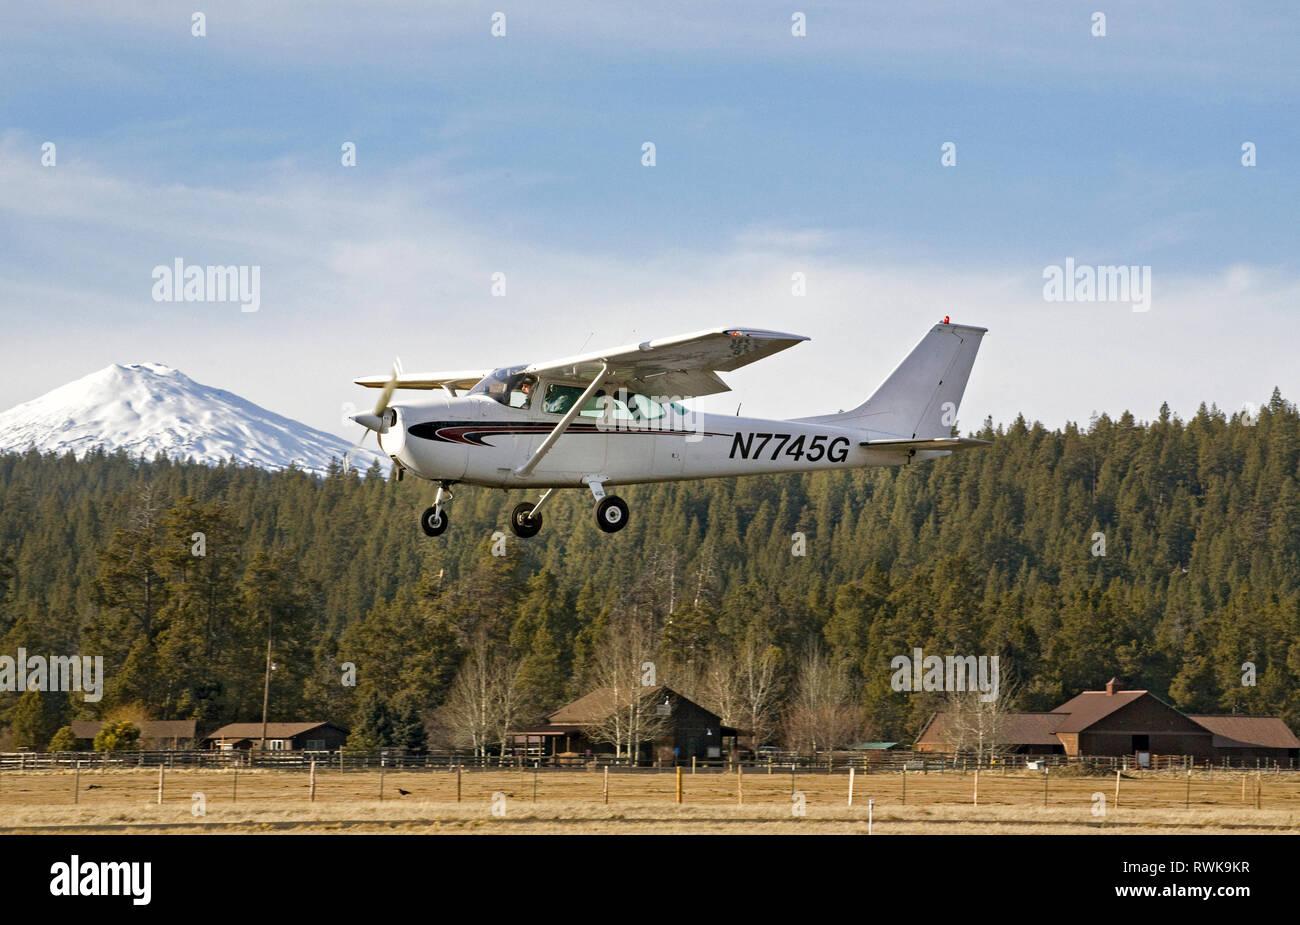 A single-engine, single wing Cessna Skyhawk, the most